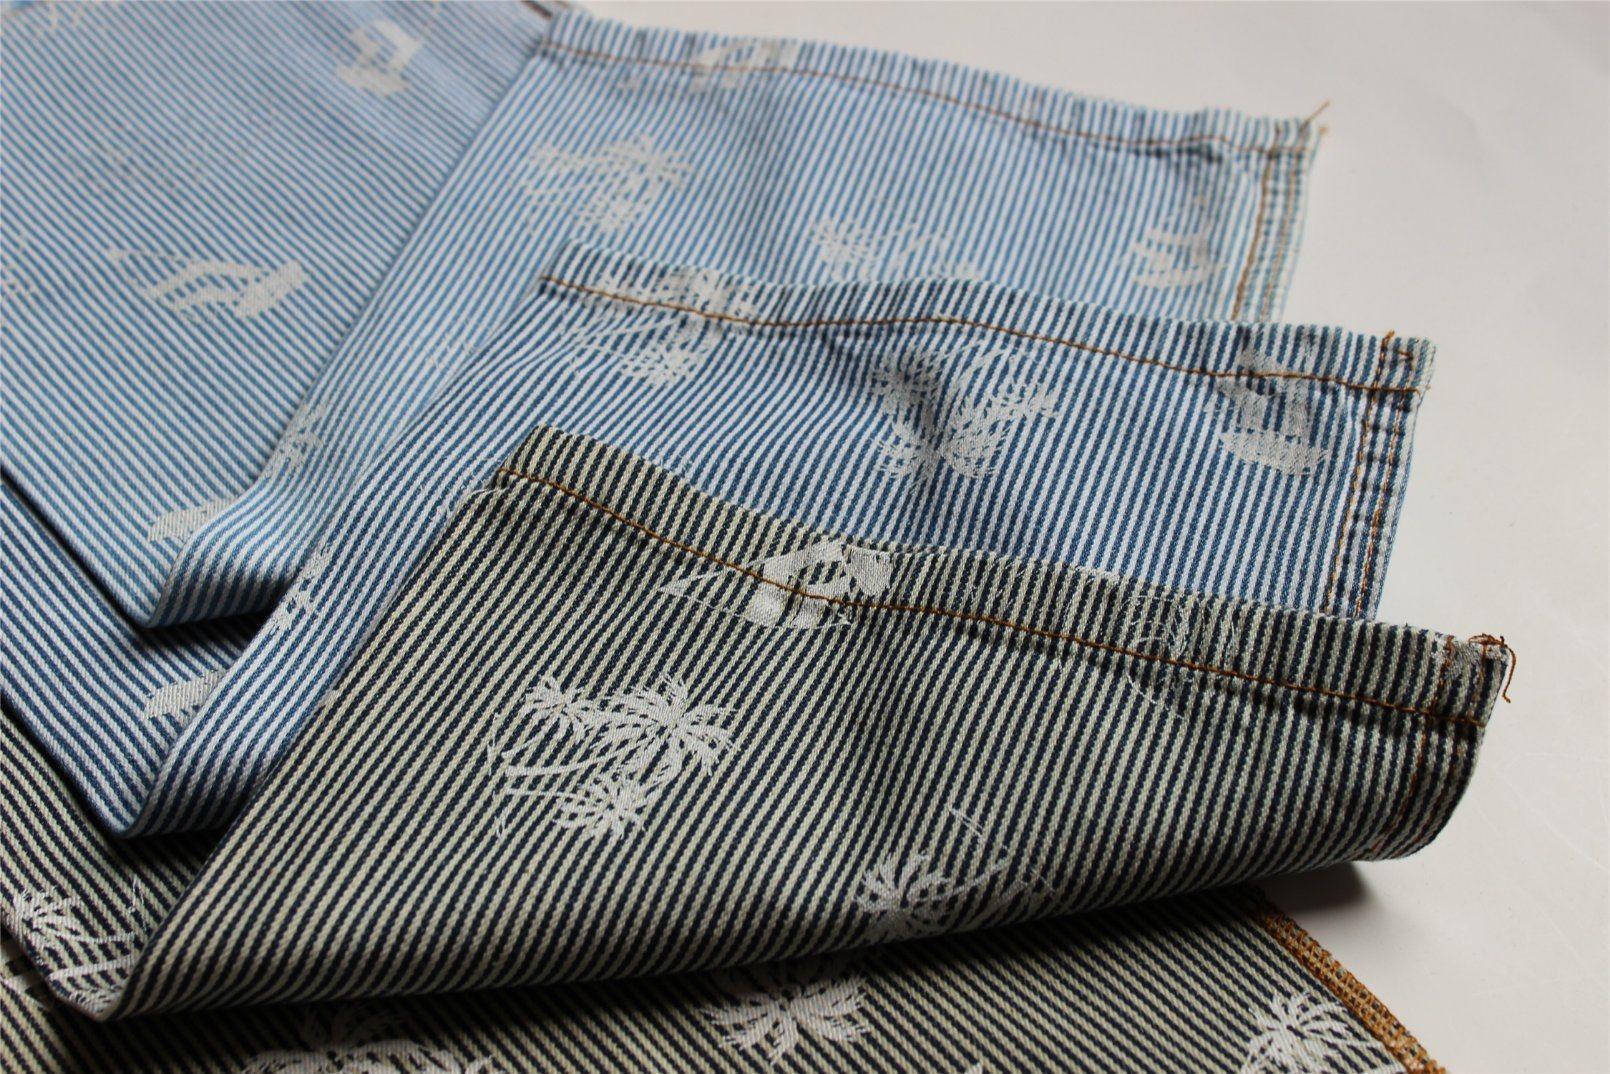 Striped Cotton Denim With Pigment Print